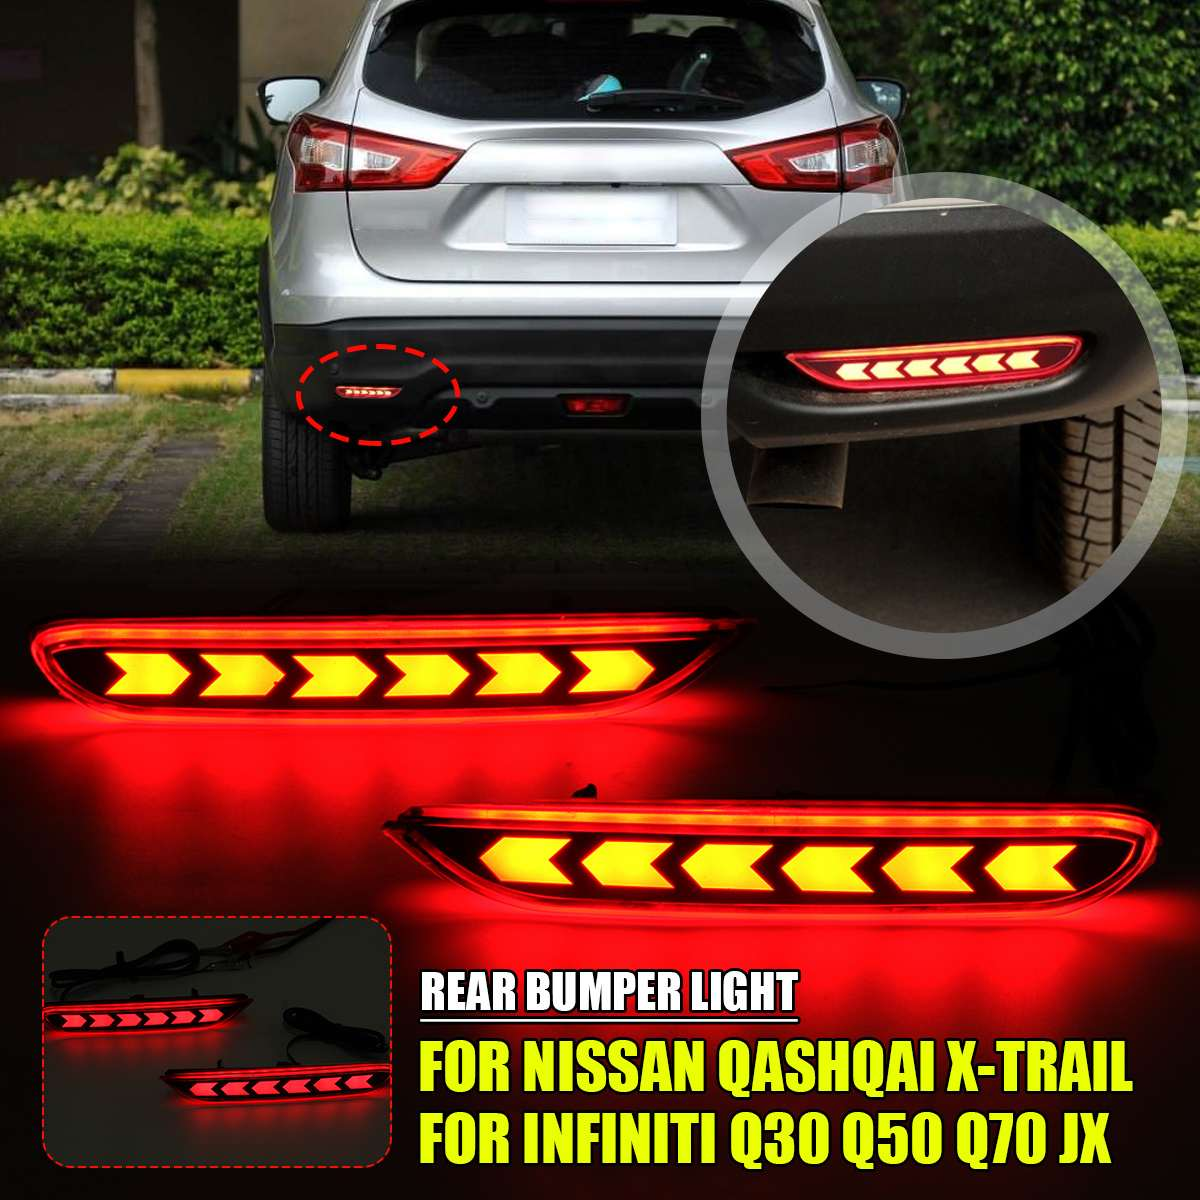 Par de Reflector de parachoques trasero para conducción de luz antiniebla para Nissan Qashqai x-trail Teana Altima Luz de Freno Led para Infiniti Q50 Q70 QX30 JX